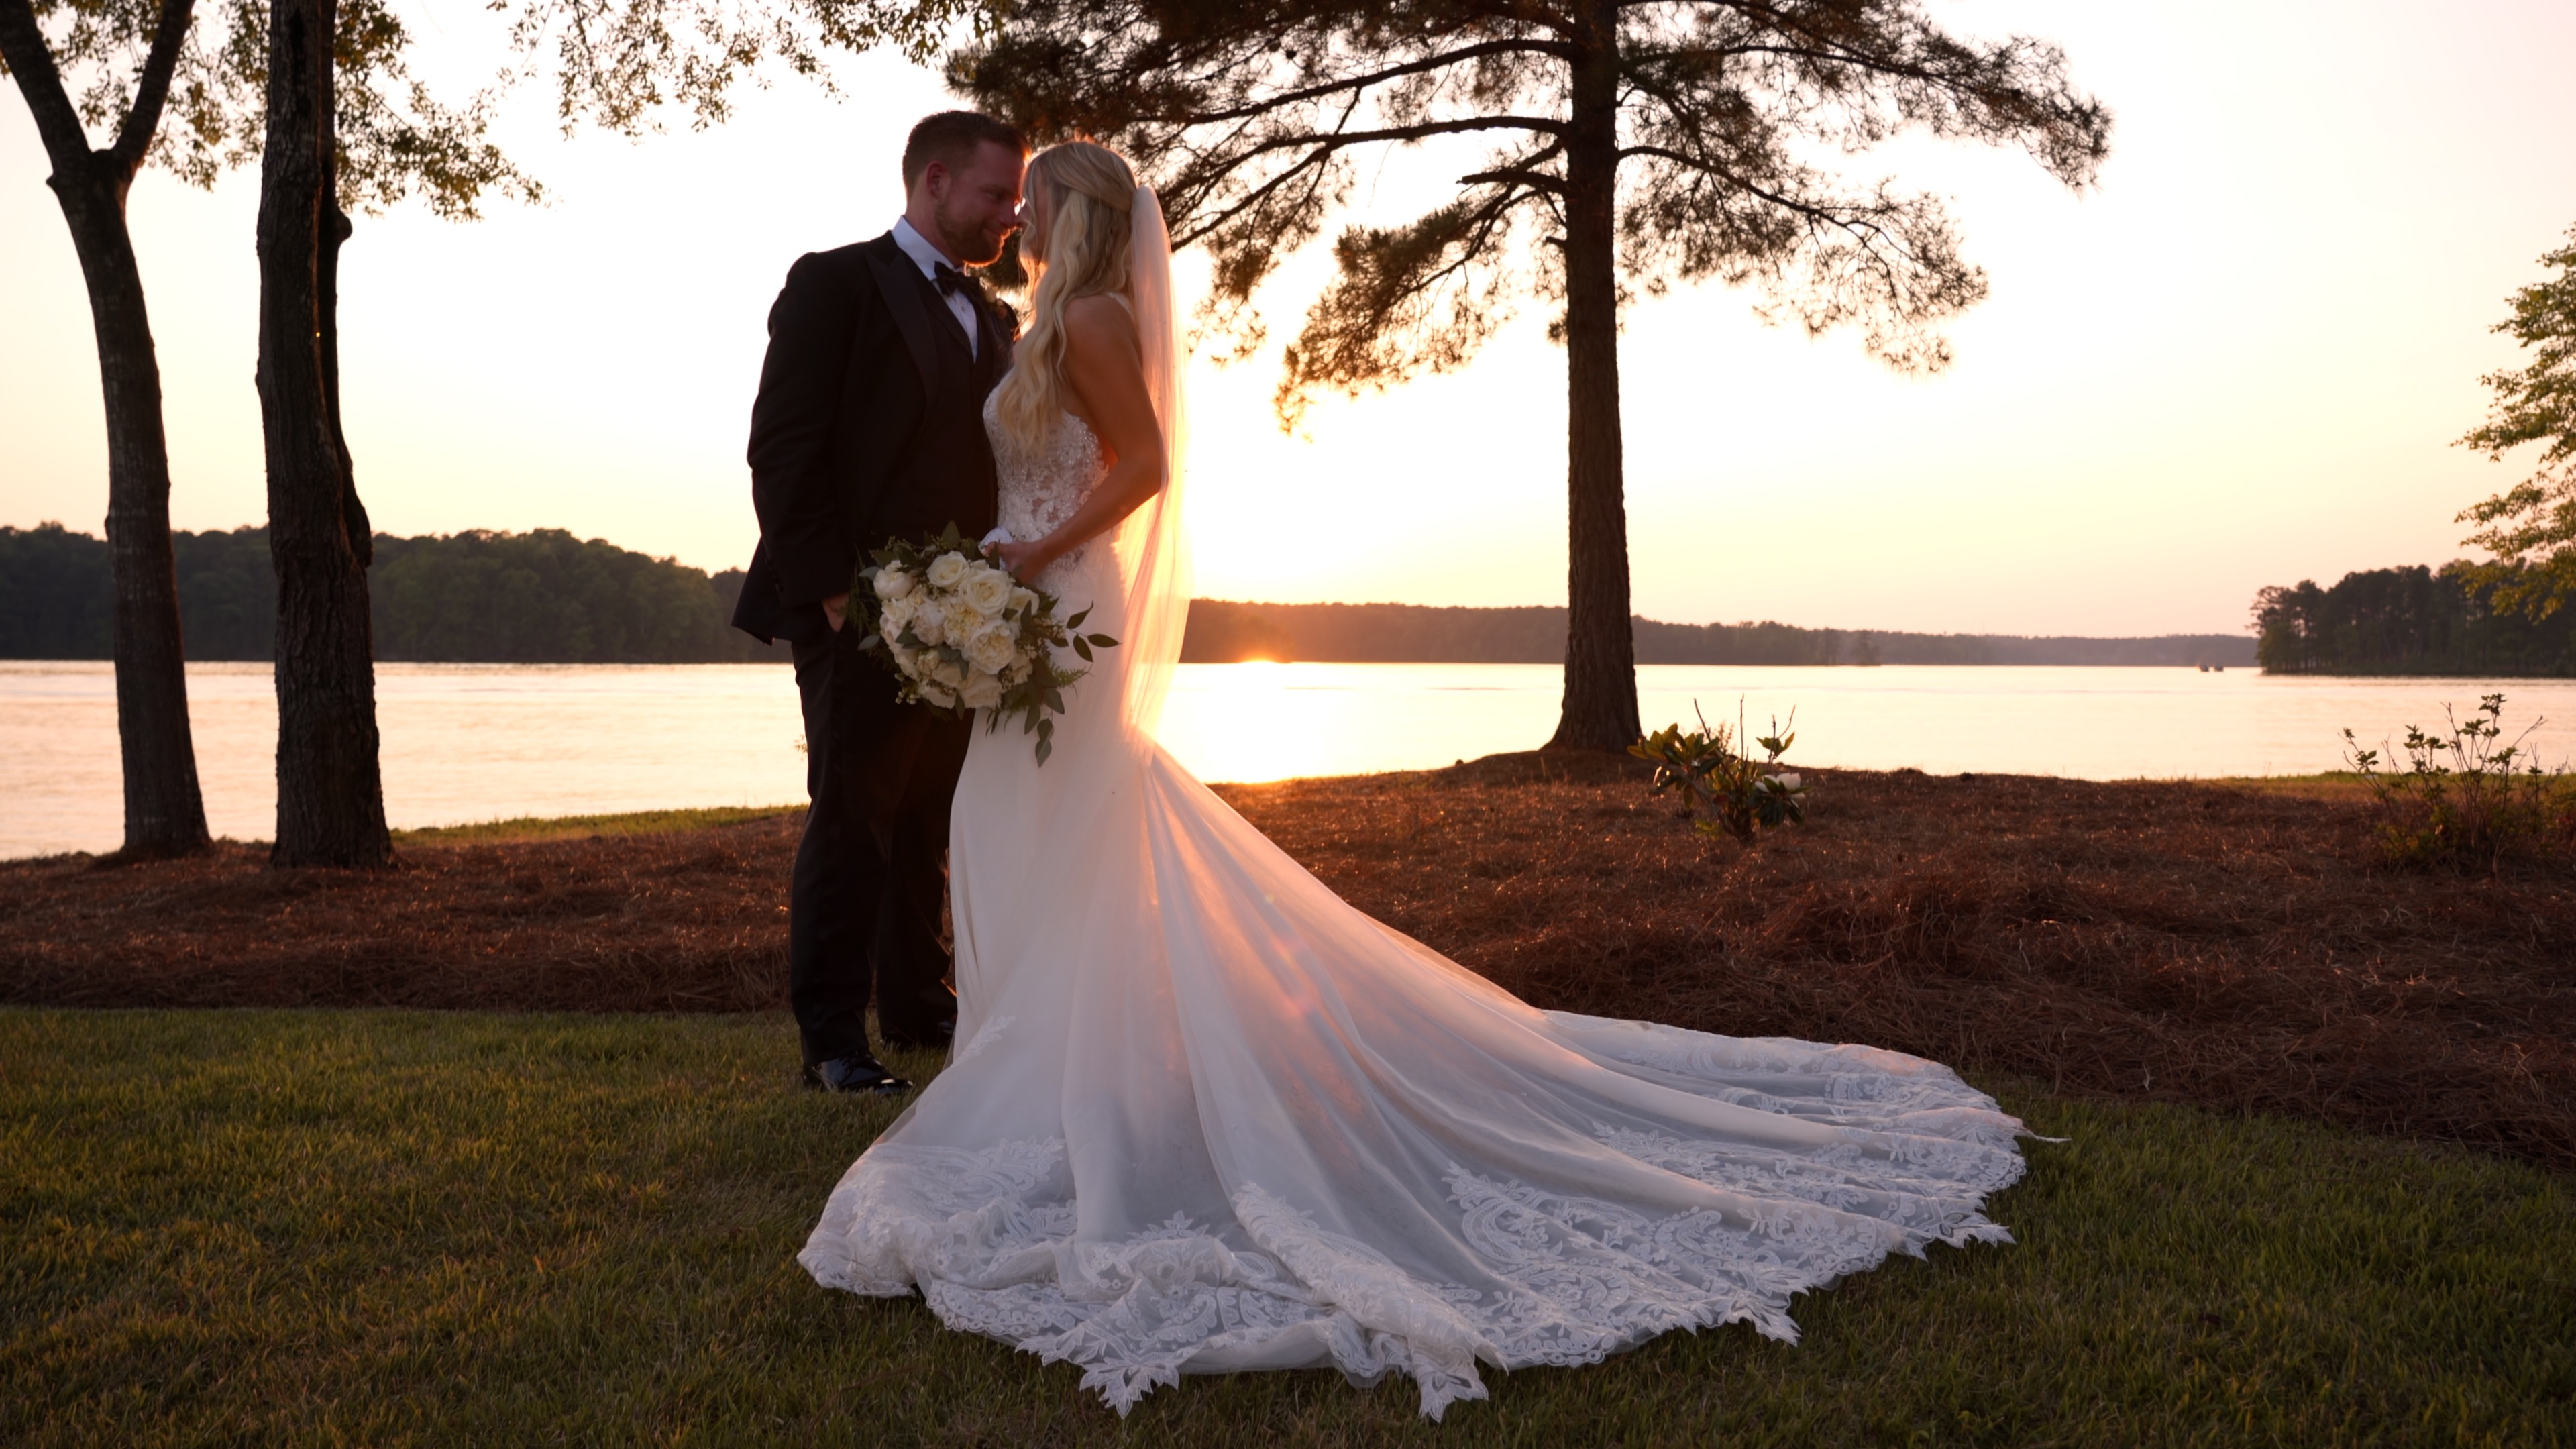 Lydia + Taylor | Eatonton, Georgia | Private Residence